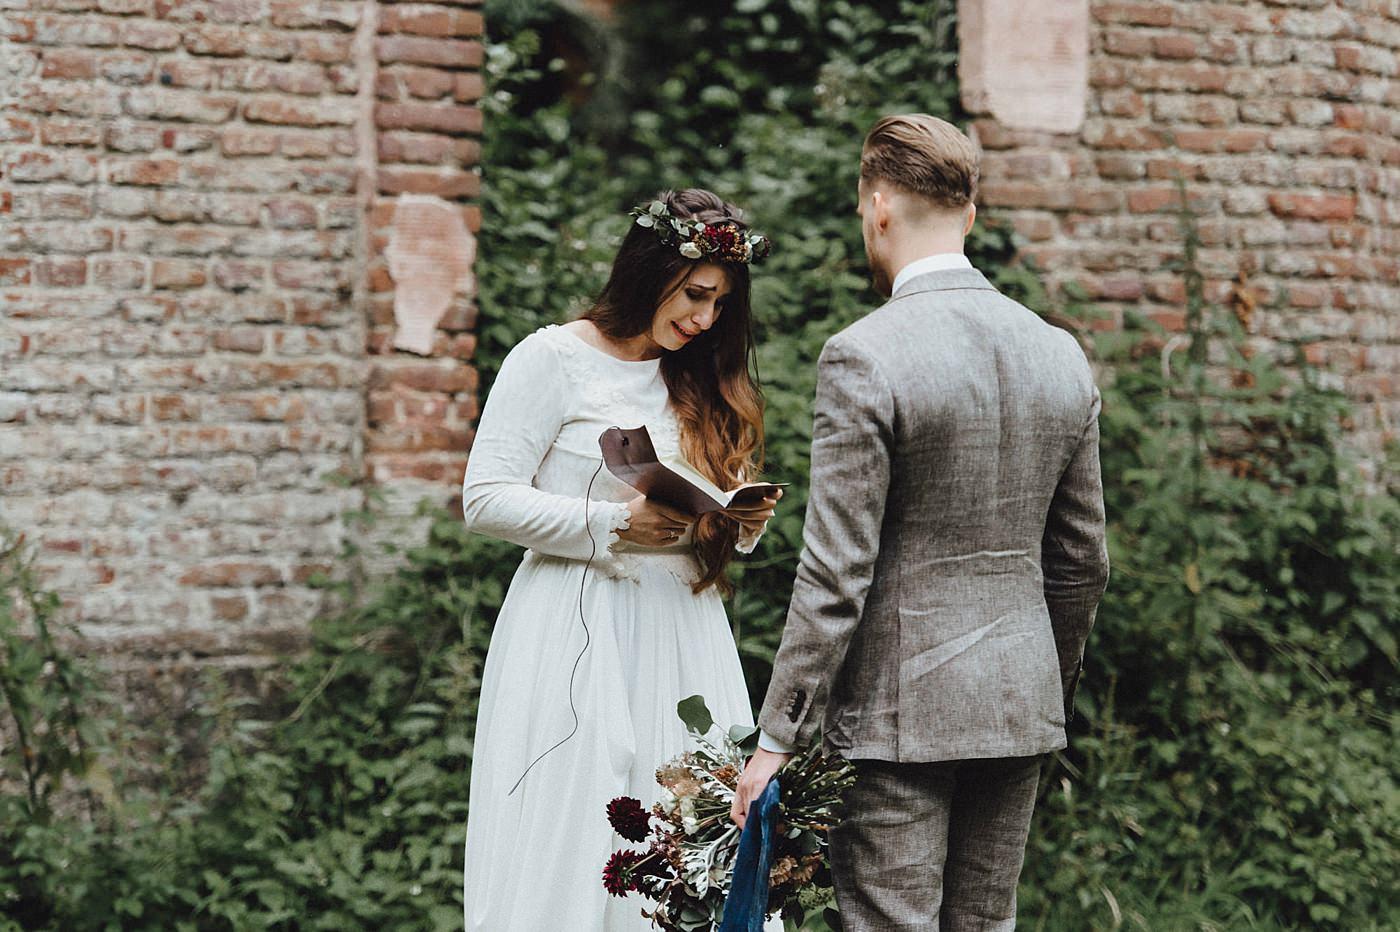 urban-elopement-wedding-114